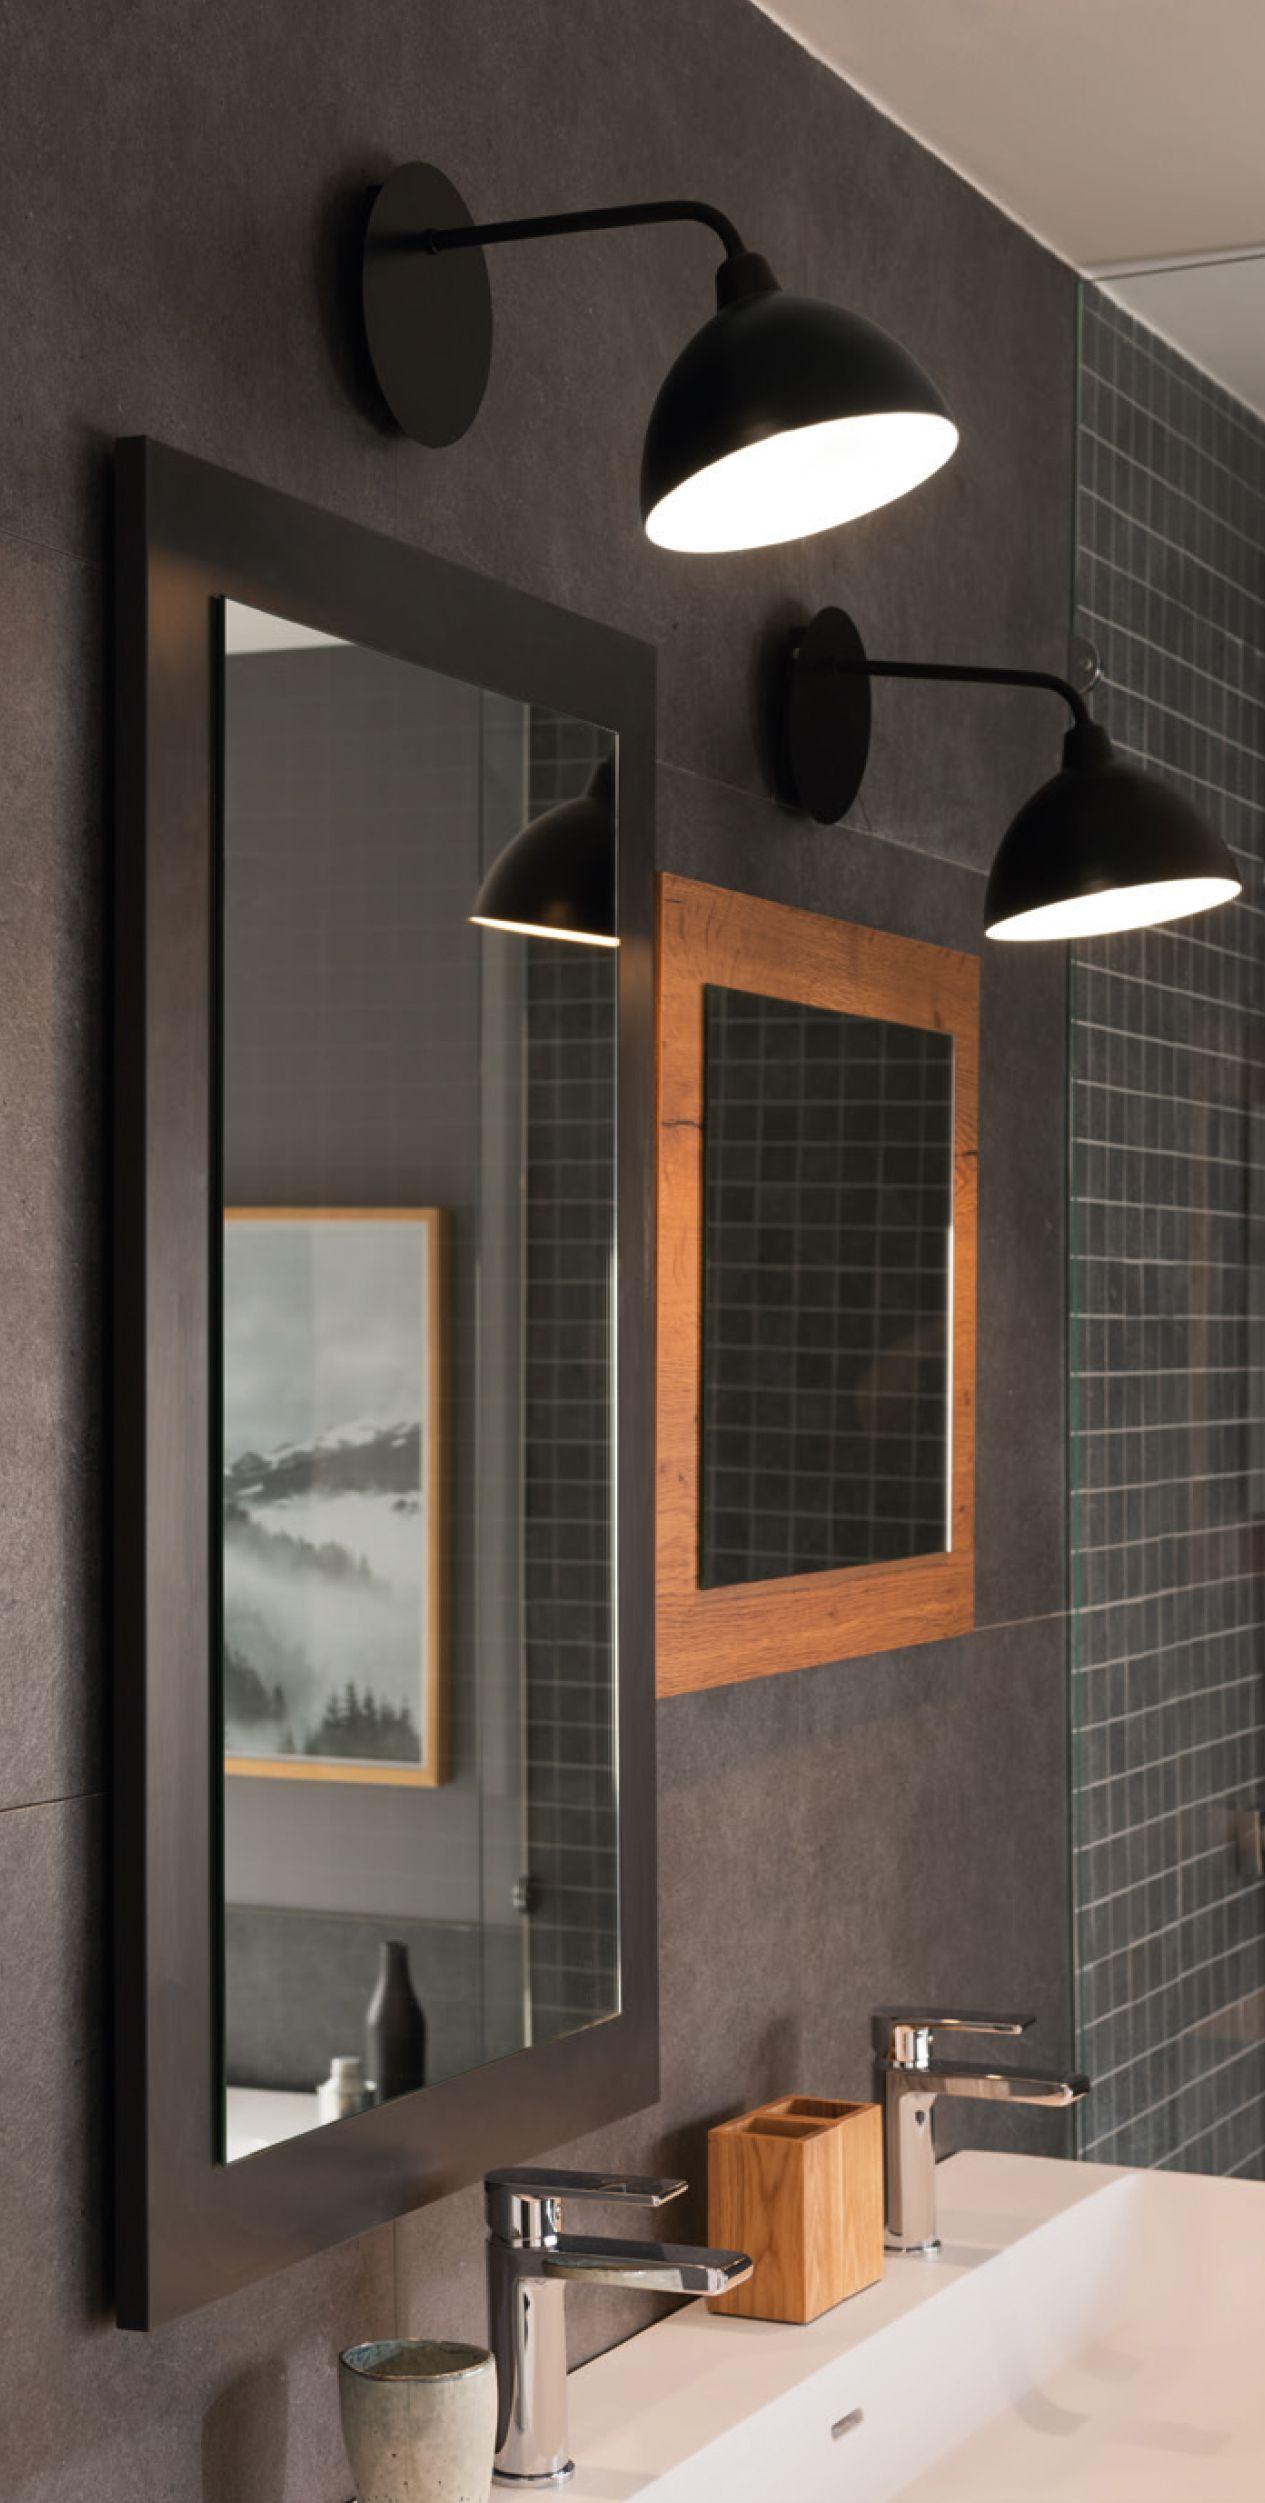 Clair Obscur | Miroir Salle De Bain, Eclairage Salle De Bain dedans Applique Salle De Bain Avec Prise Castorama